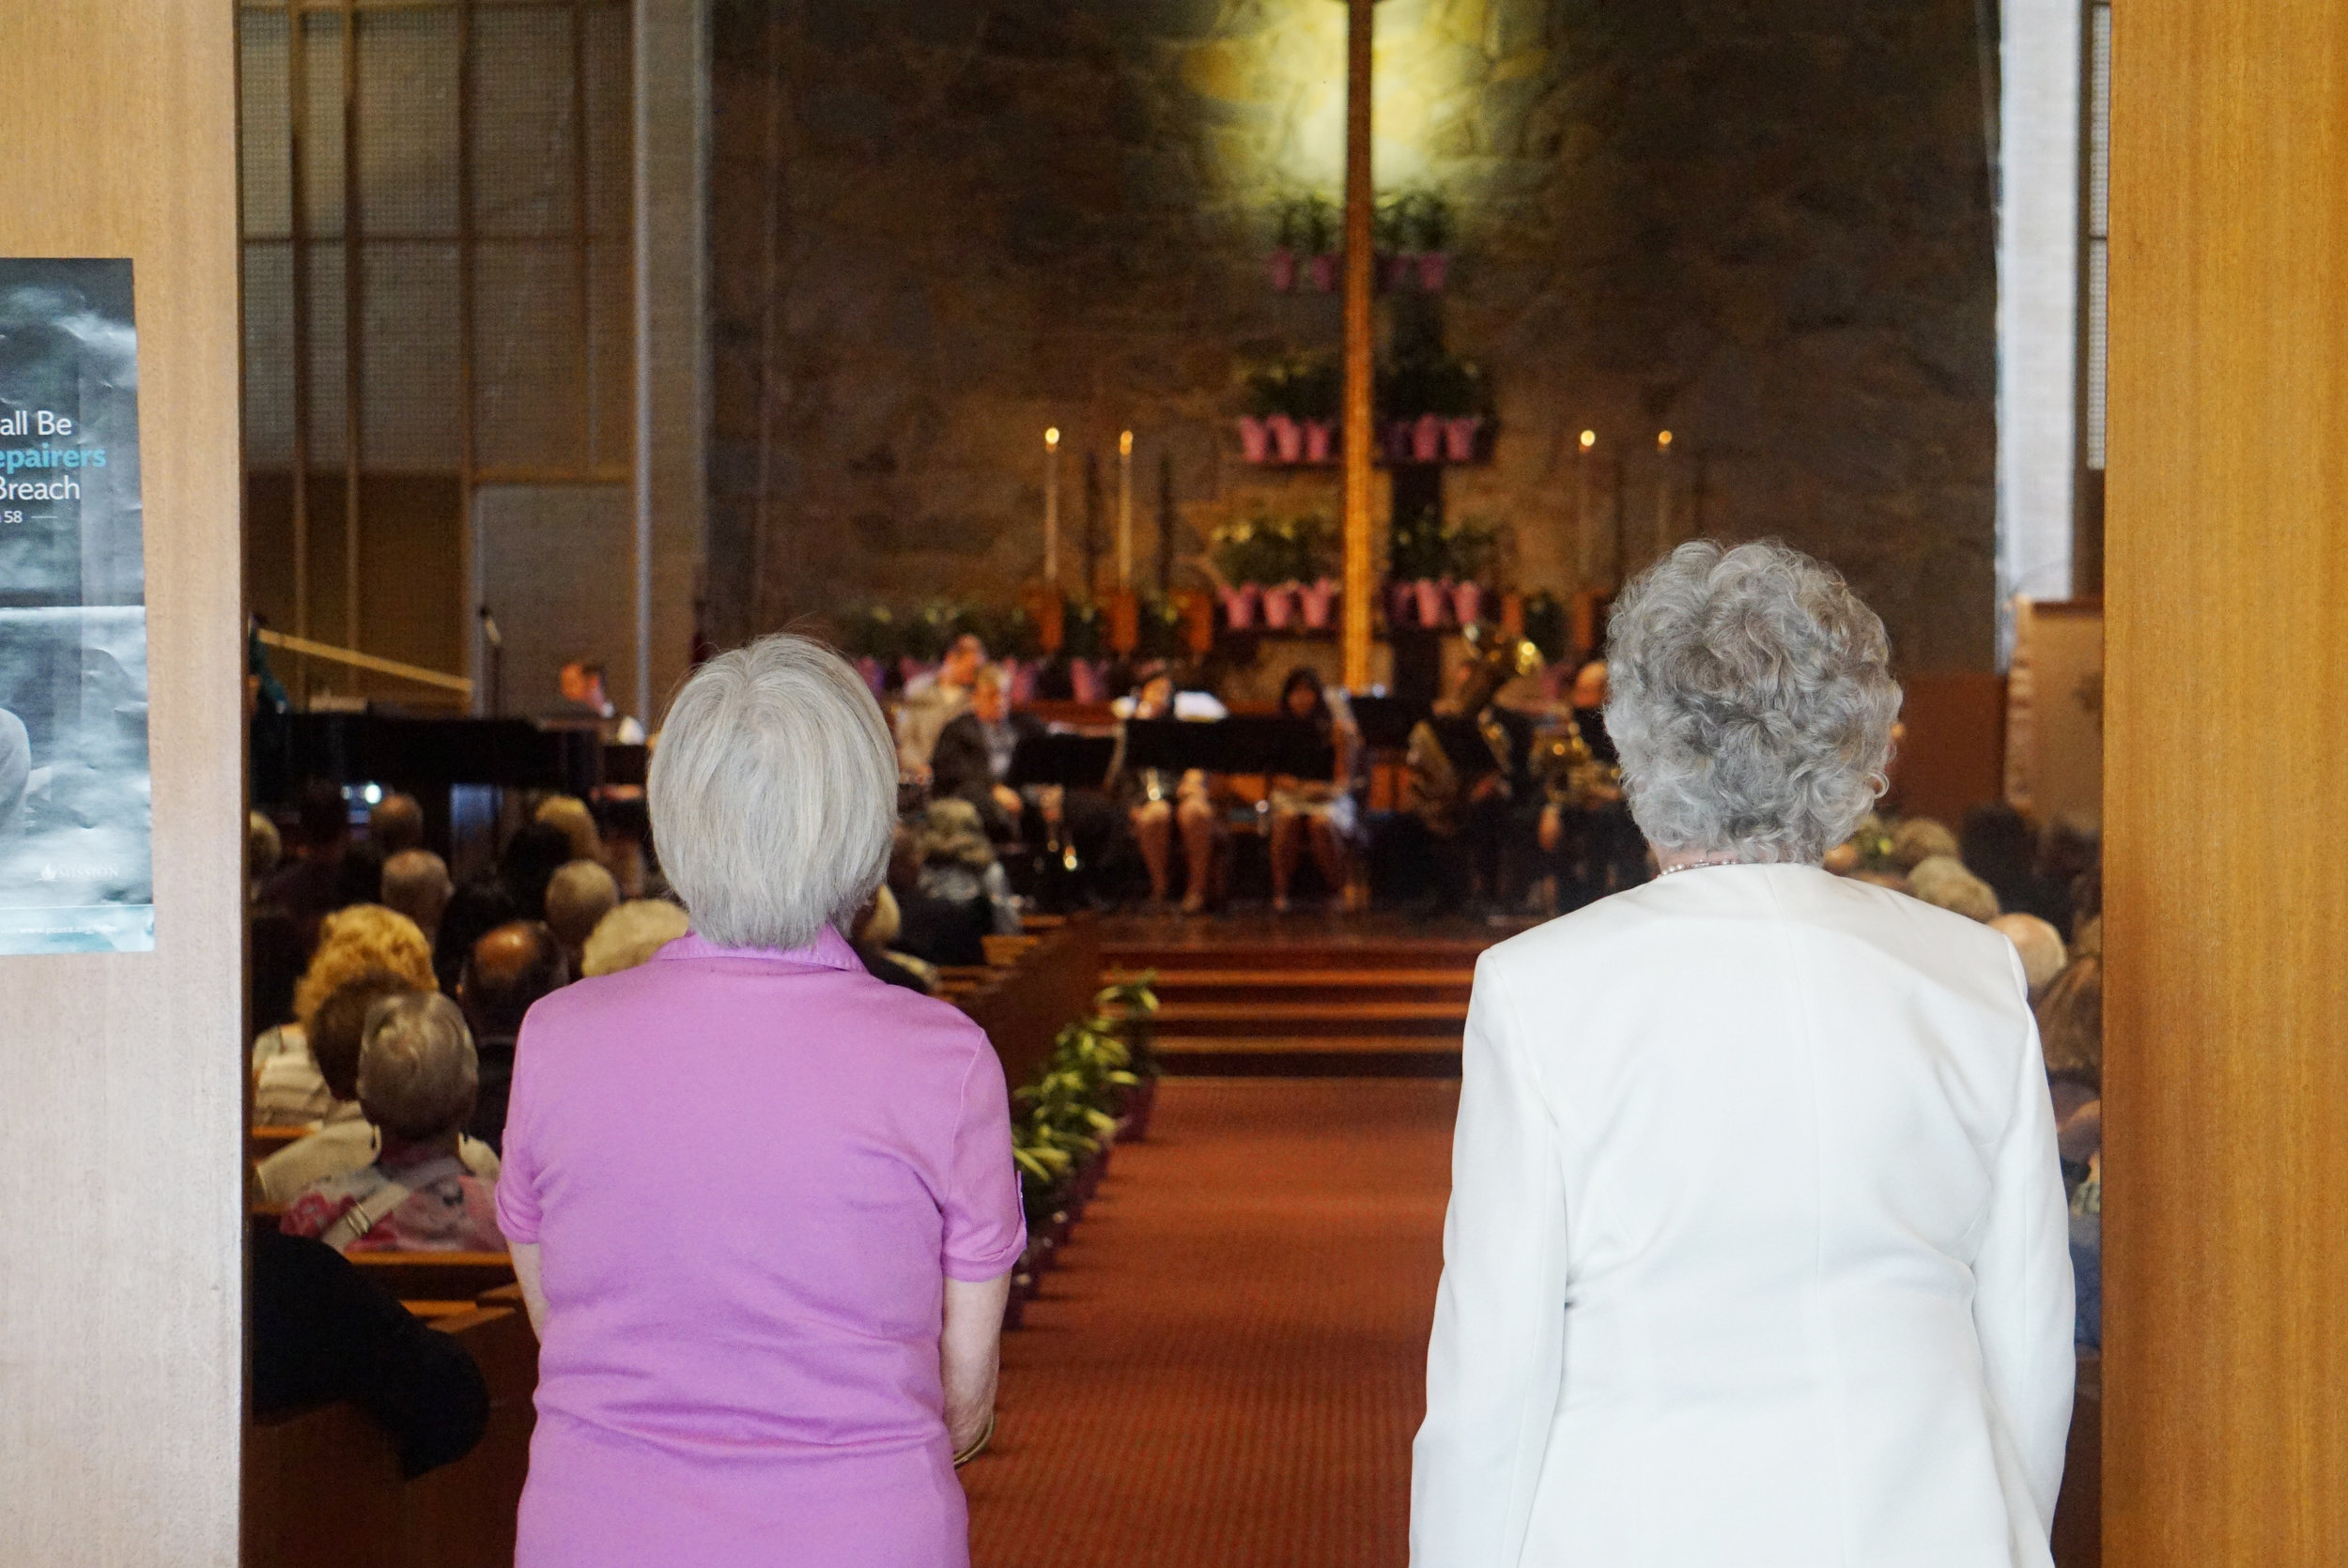 claremont-presbyterian-church-easter-offering.jpg